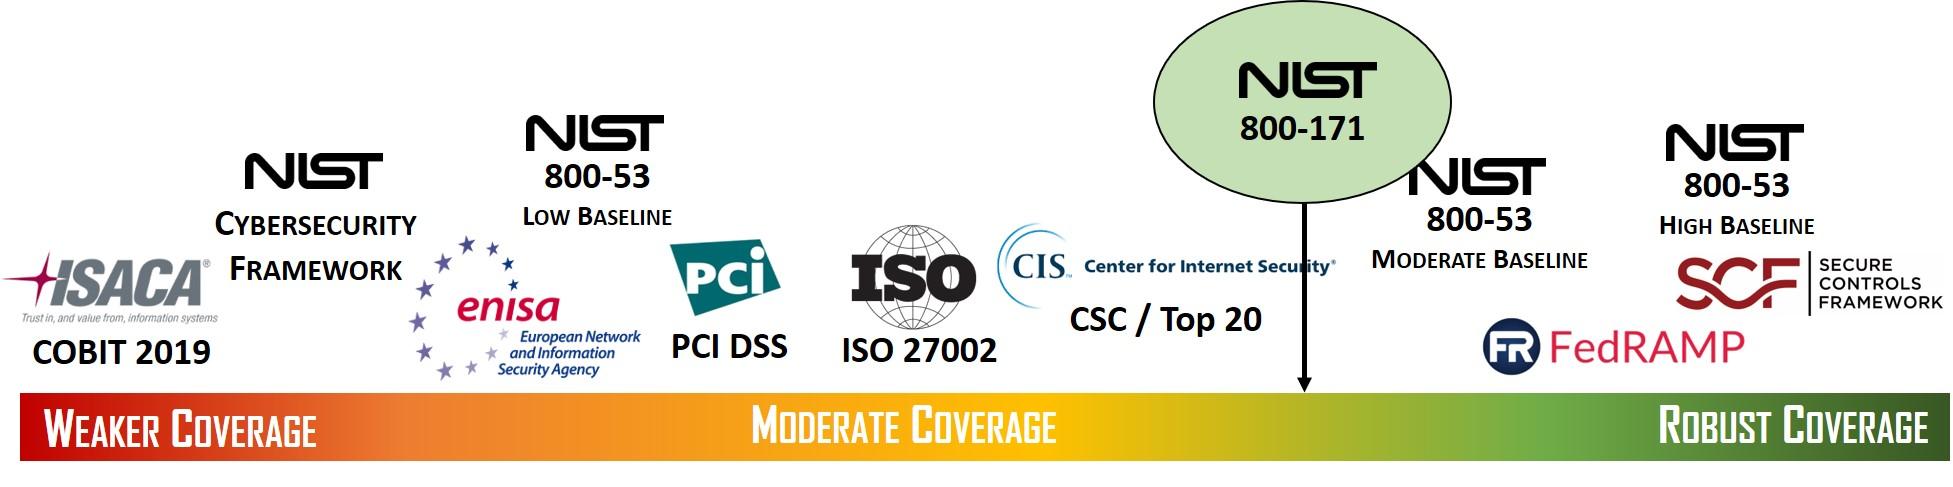 2020-cybersecurity-goldilocks-spectrum-comparison-nist-800-171.jpg